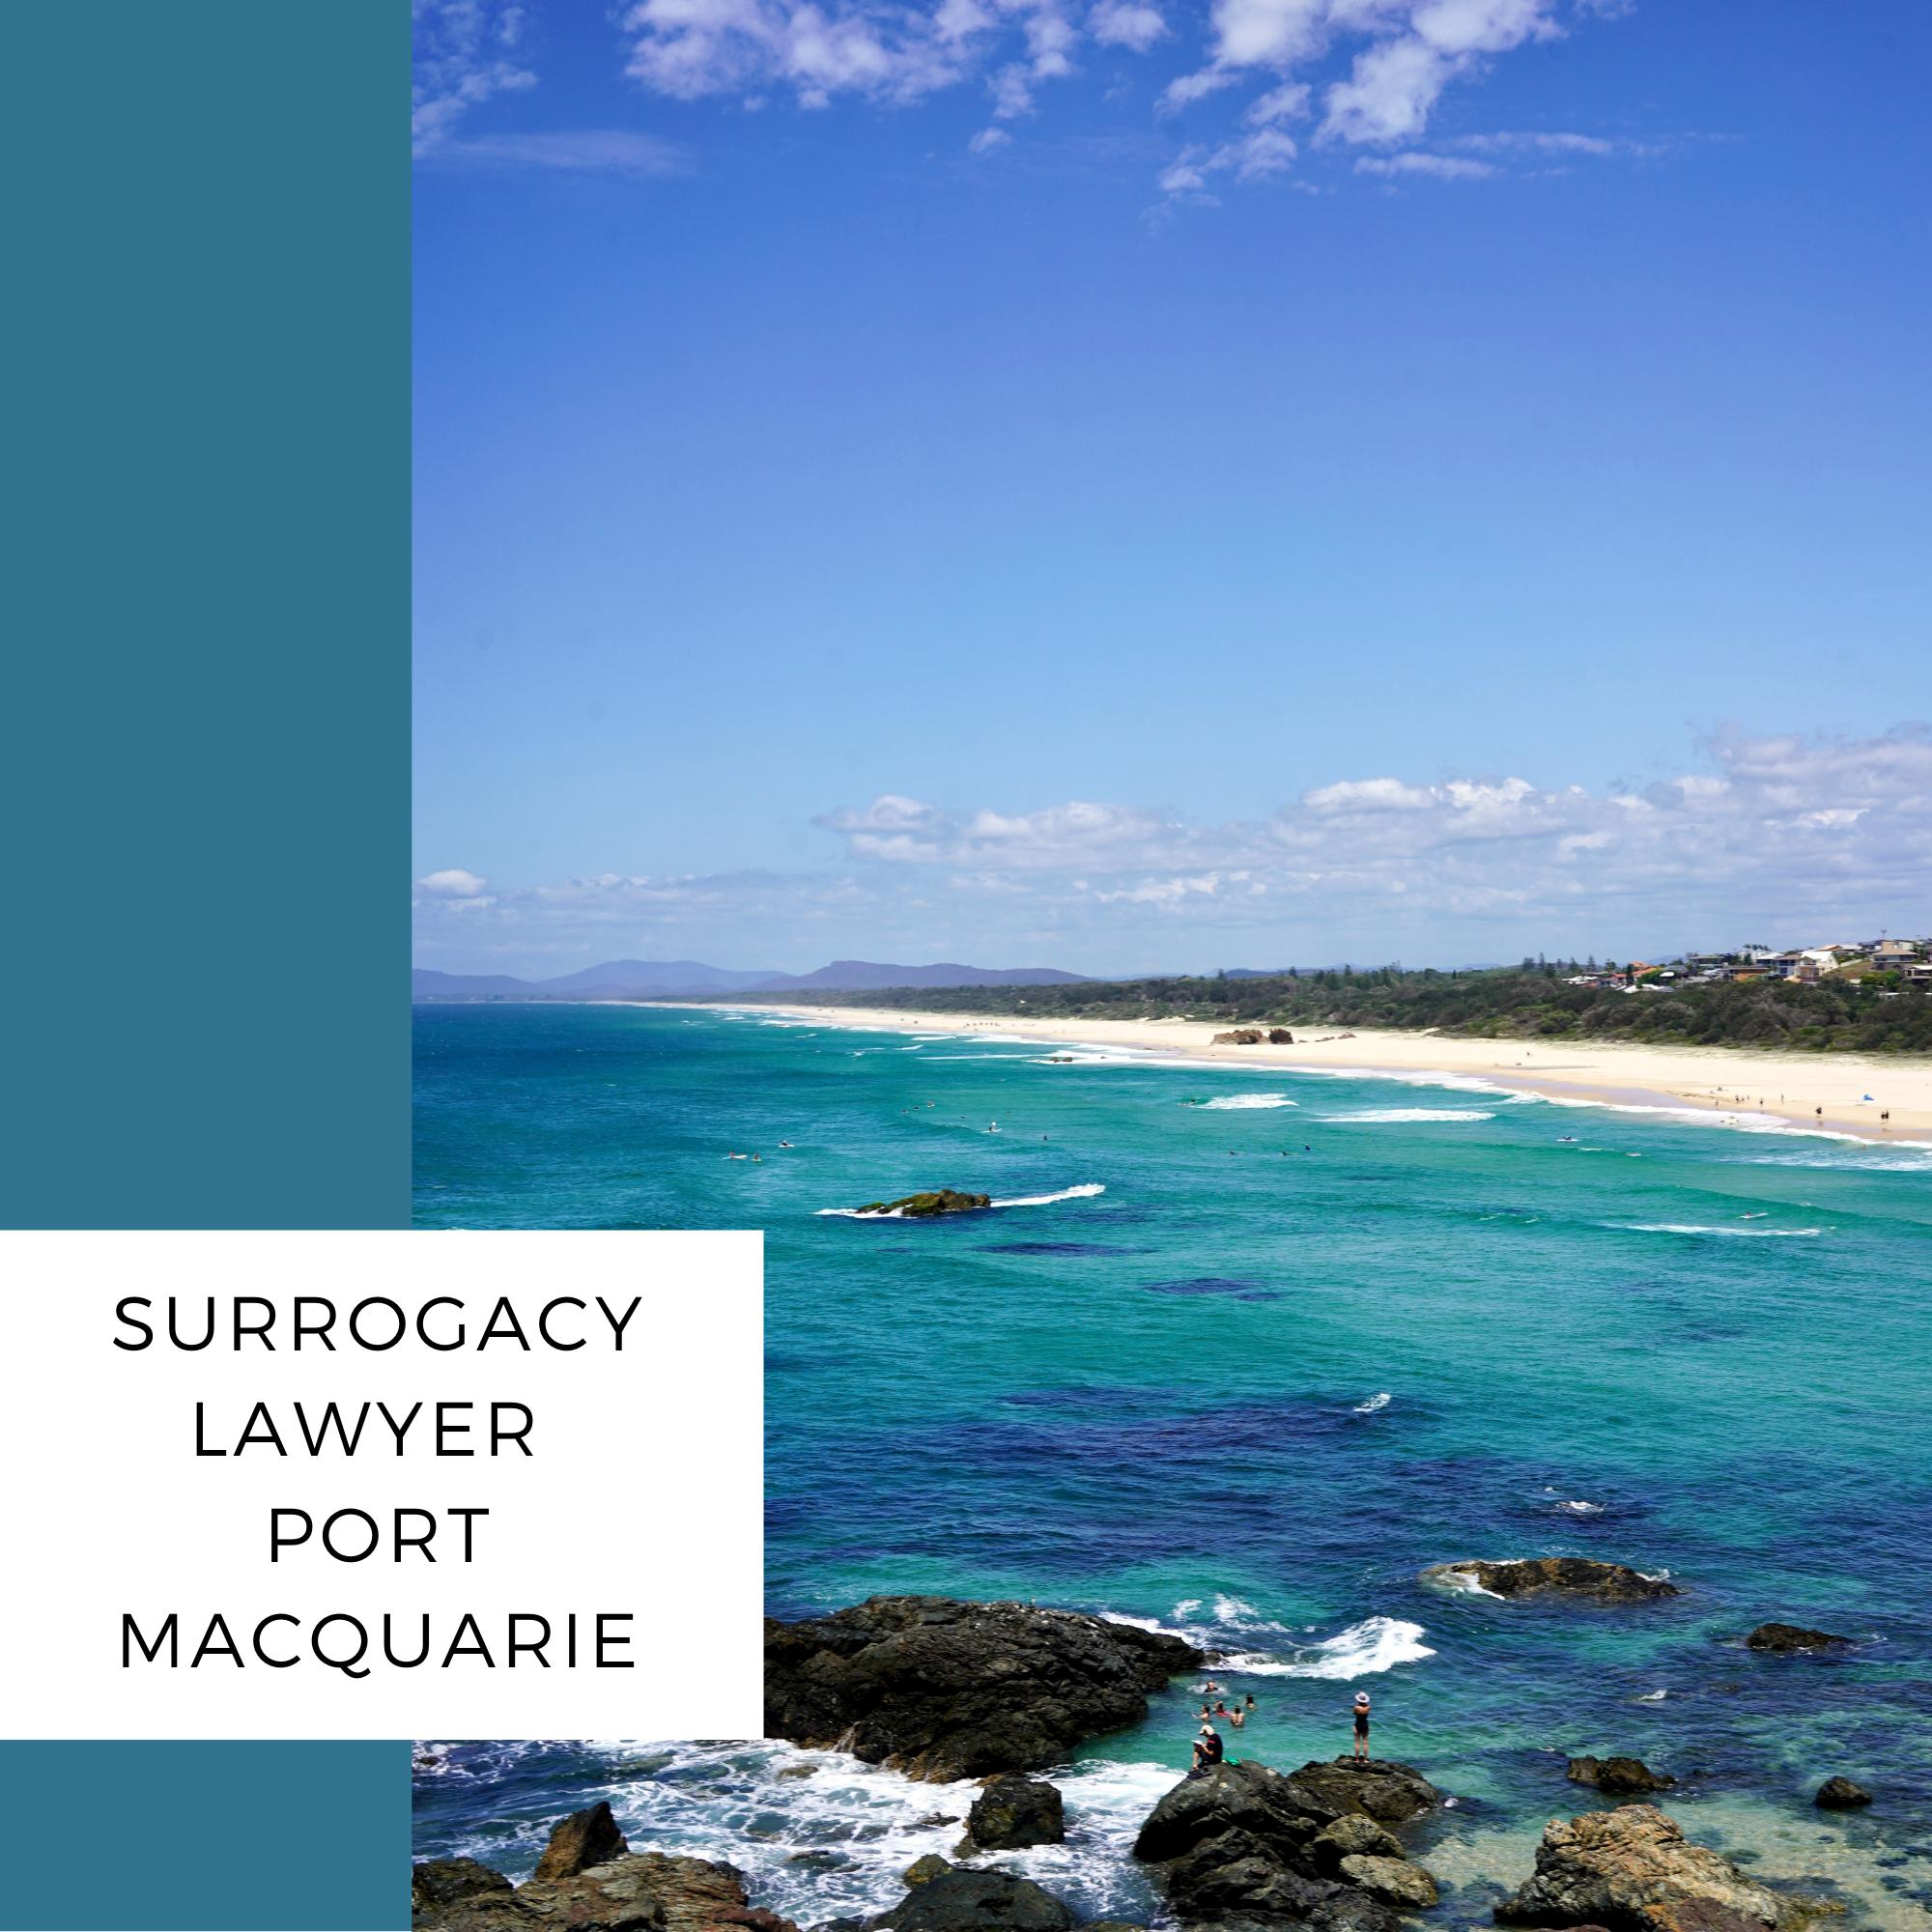 surrogacy port macquarie